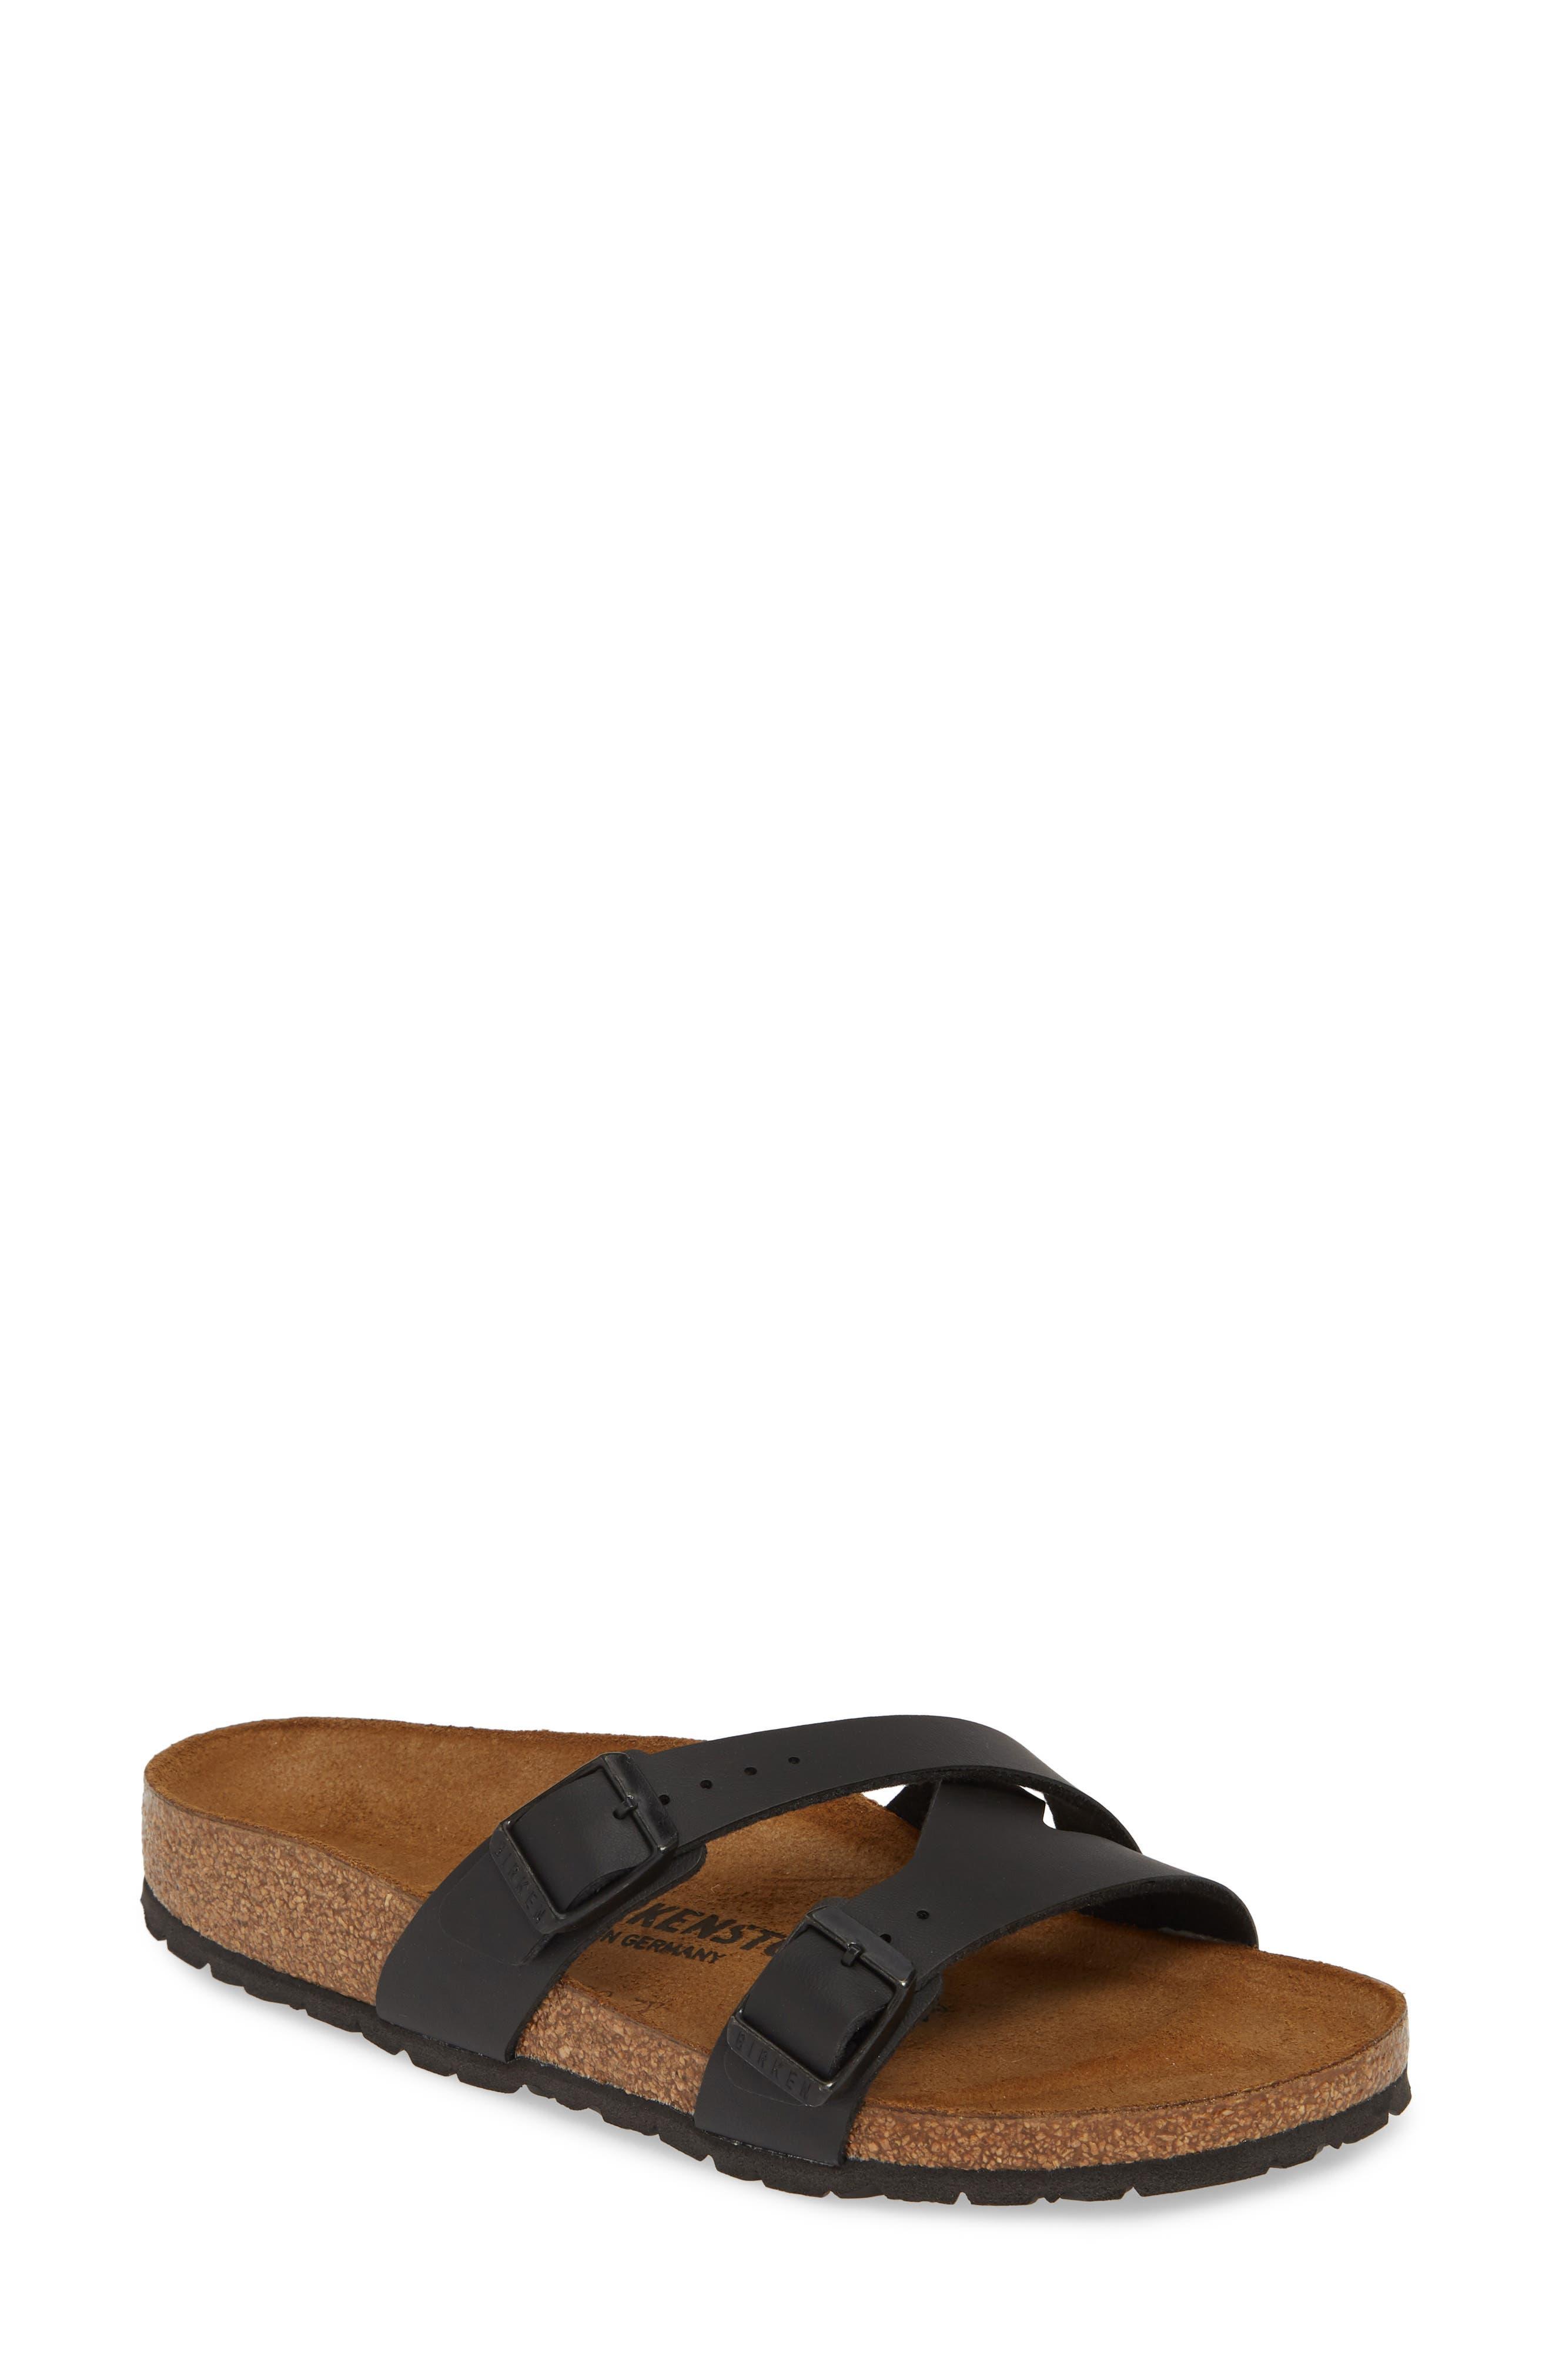 Birkenstock Yao Slide Sandal,8.5 B - Black